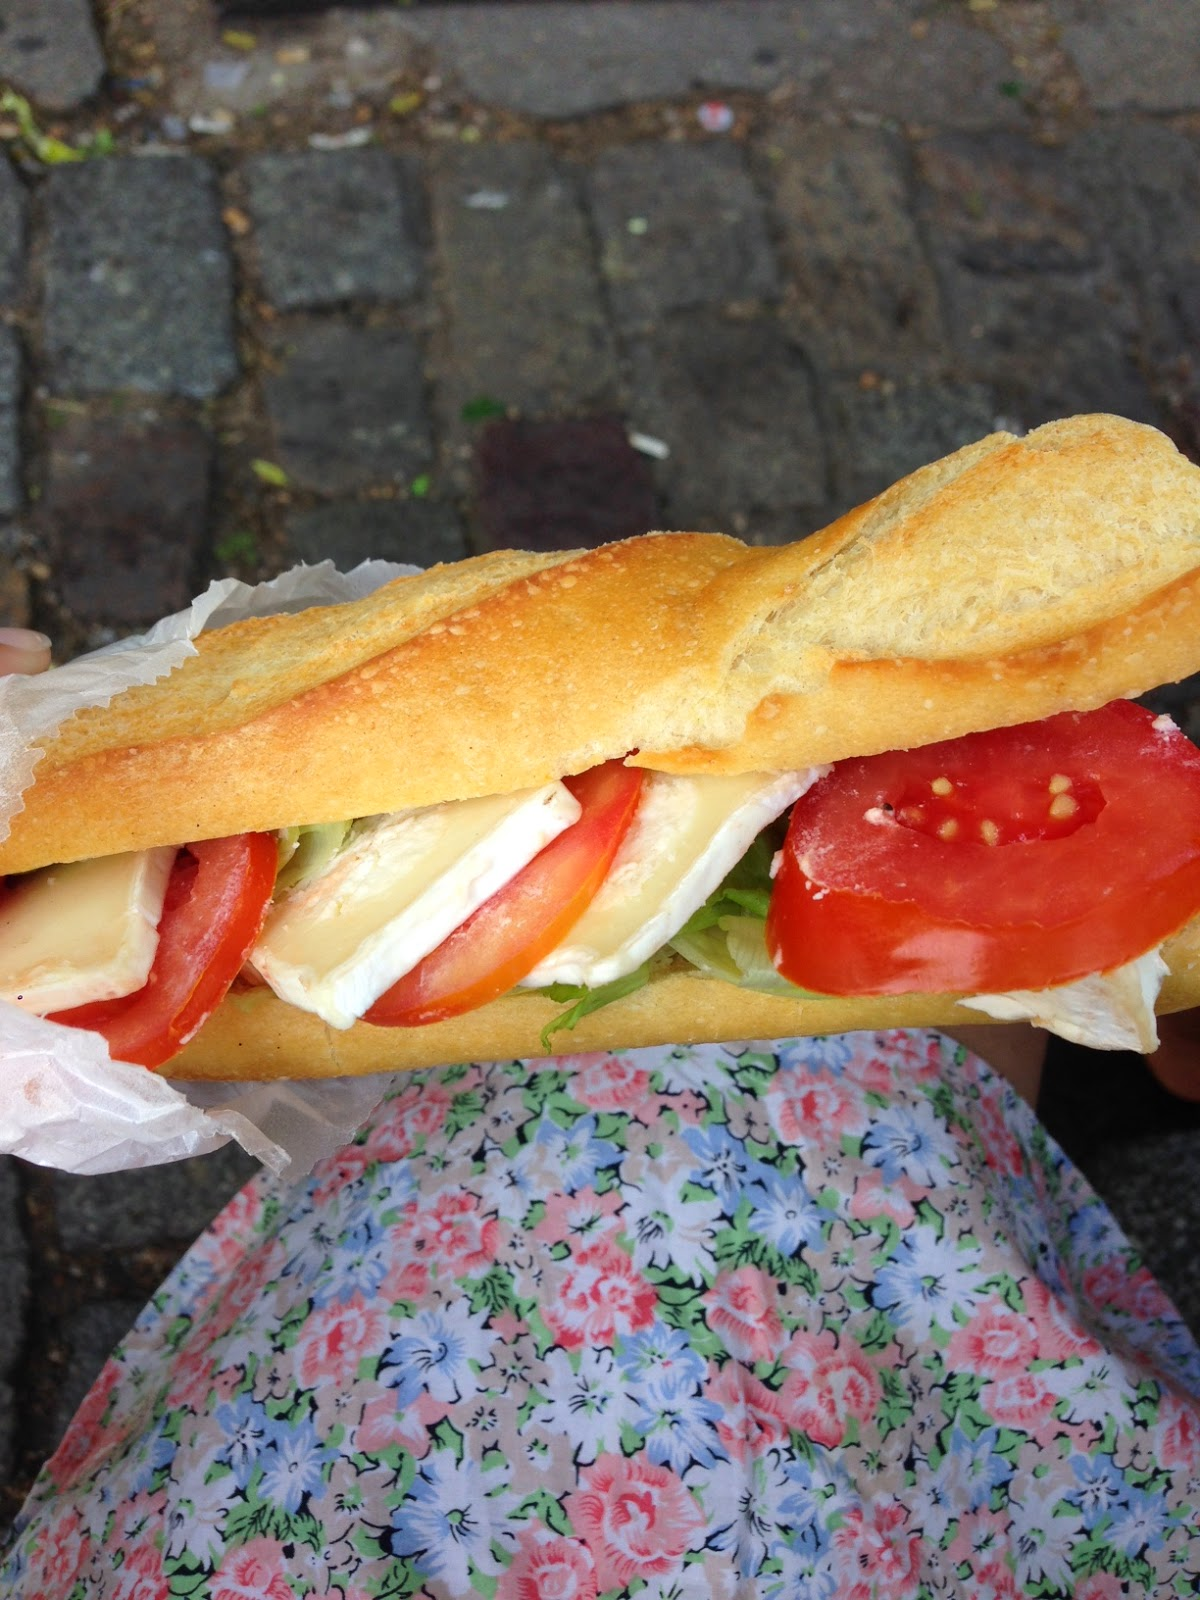 Milkshakes And Pattycakes: Adventures In Food: France